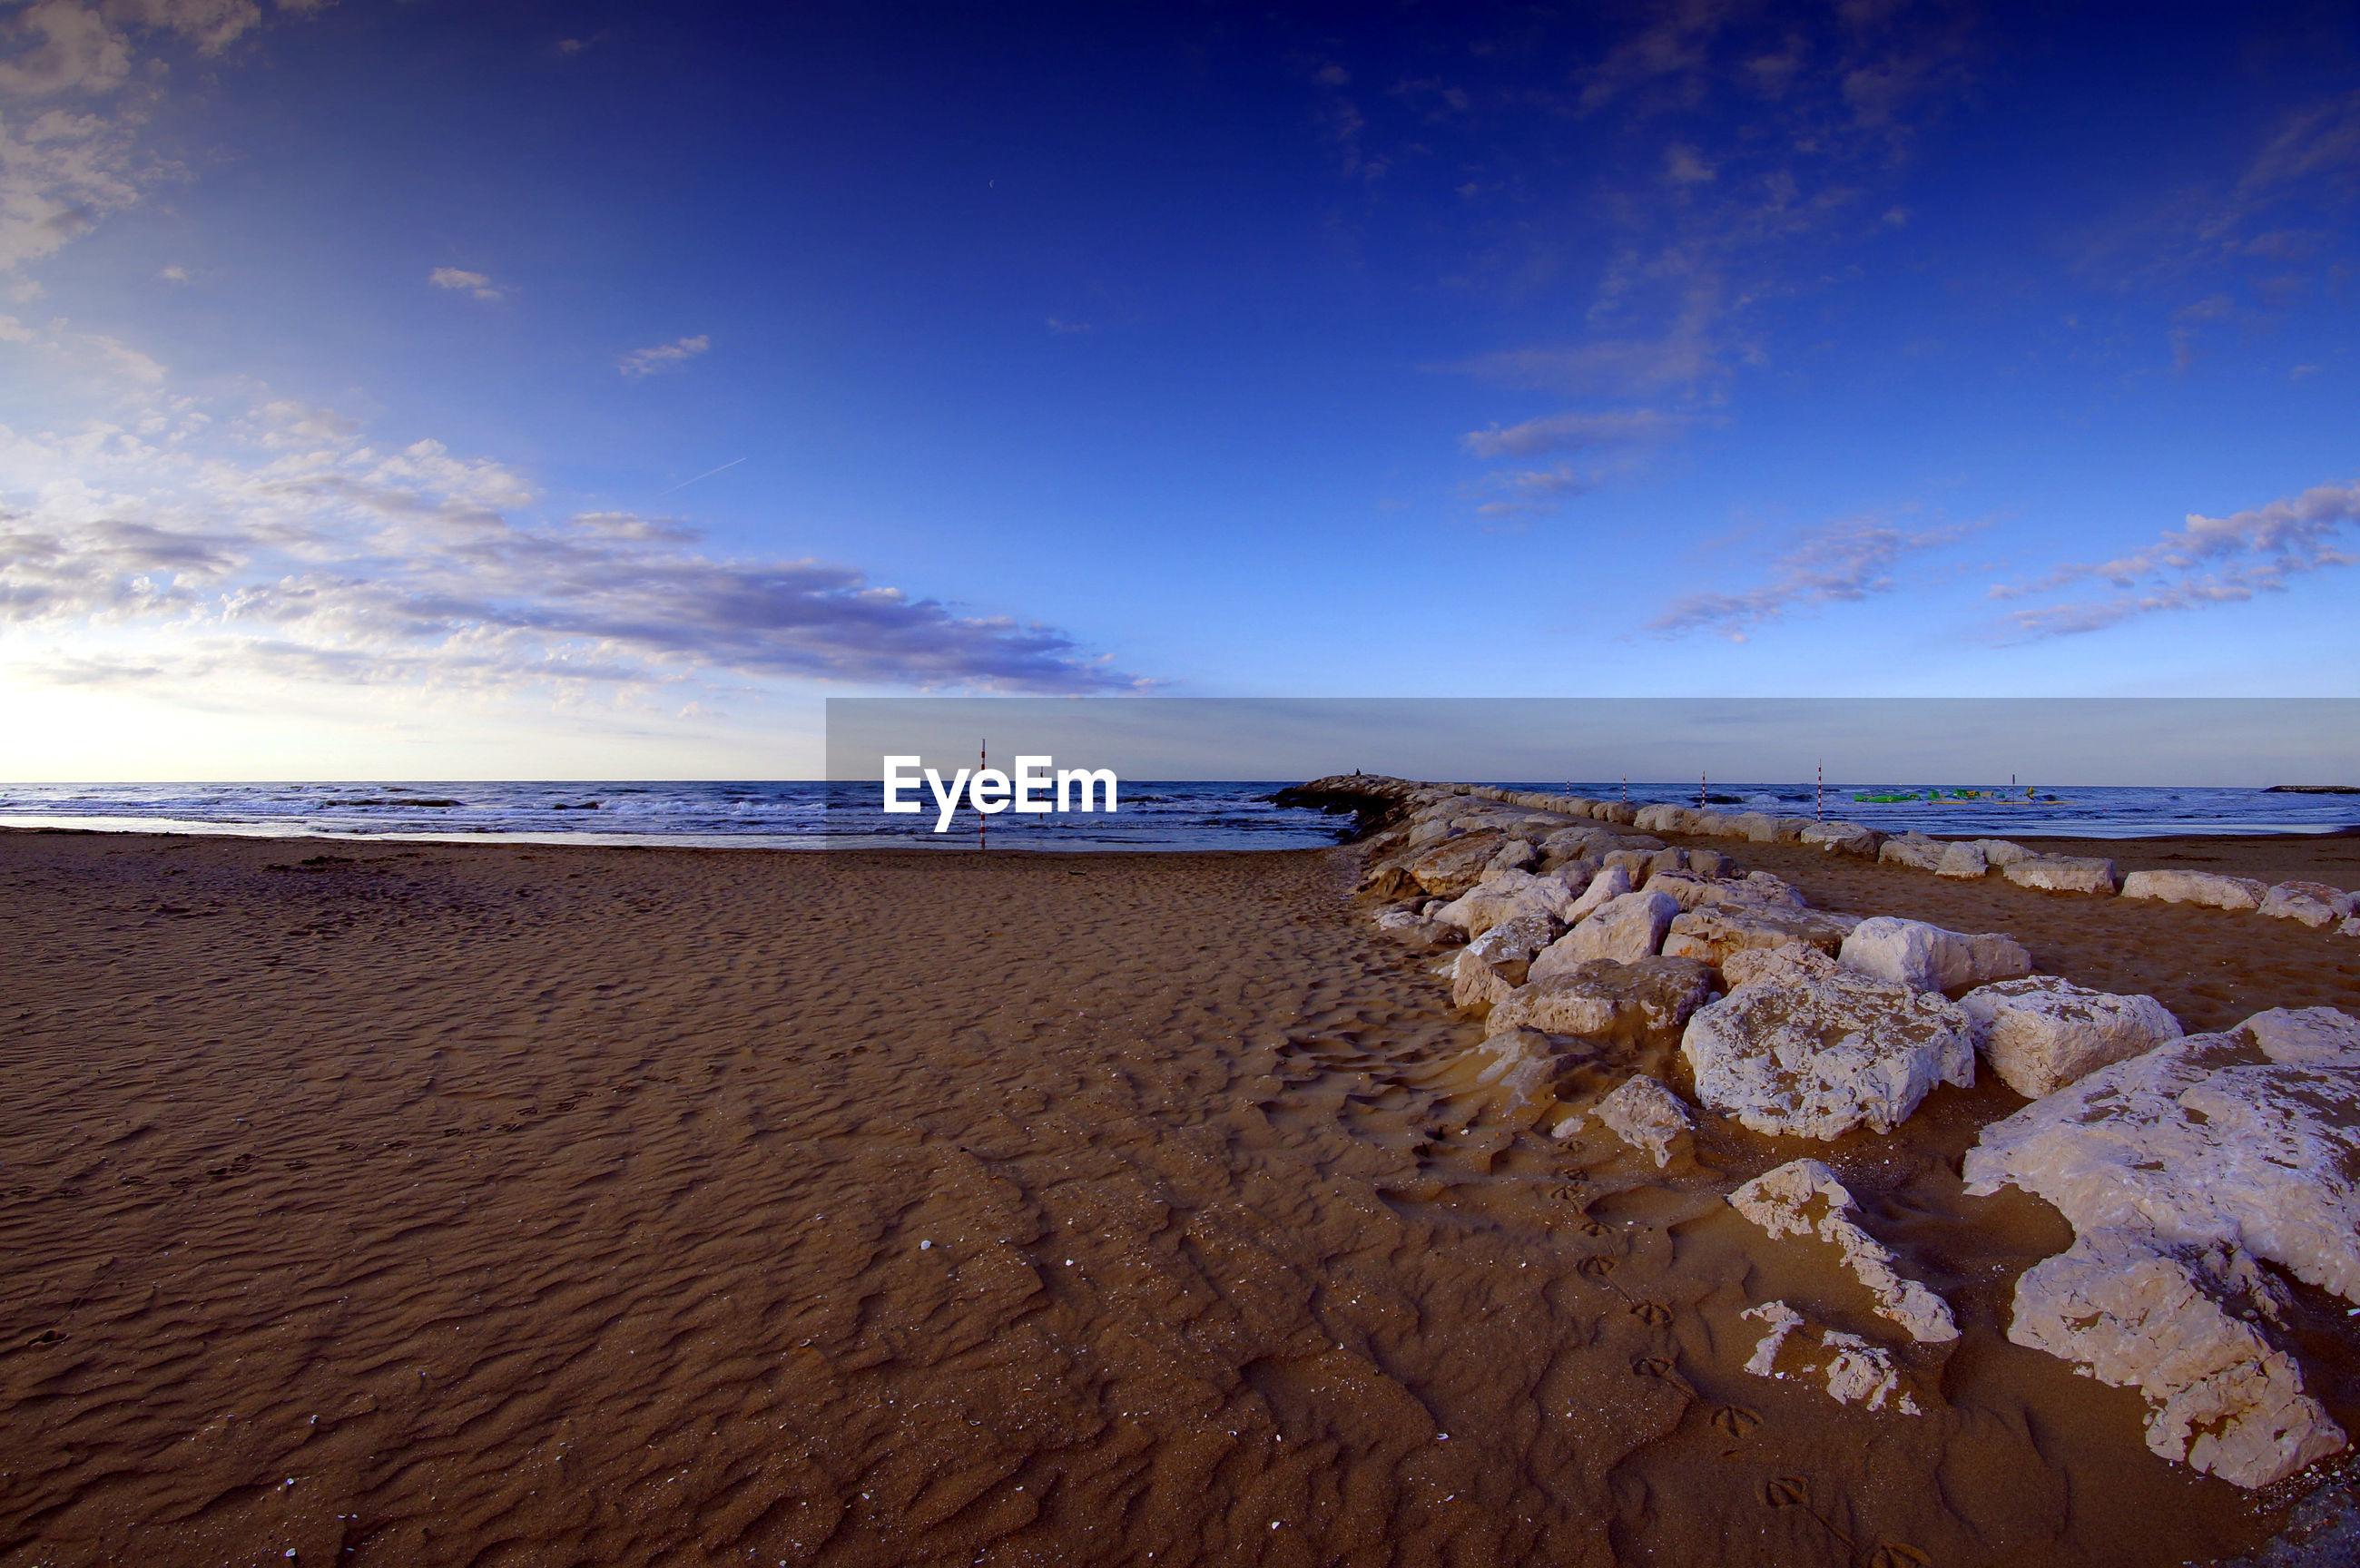 VIEW OF BEACH